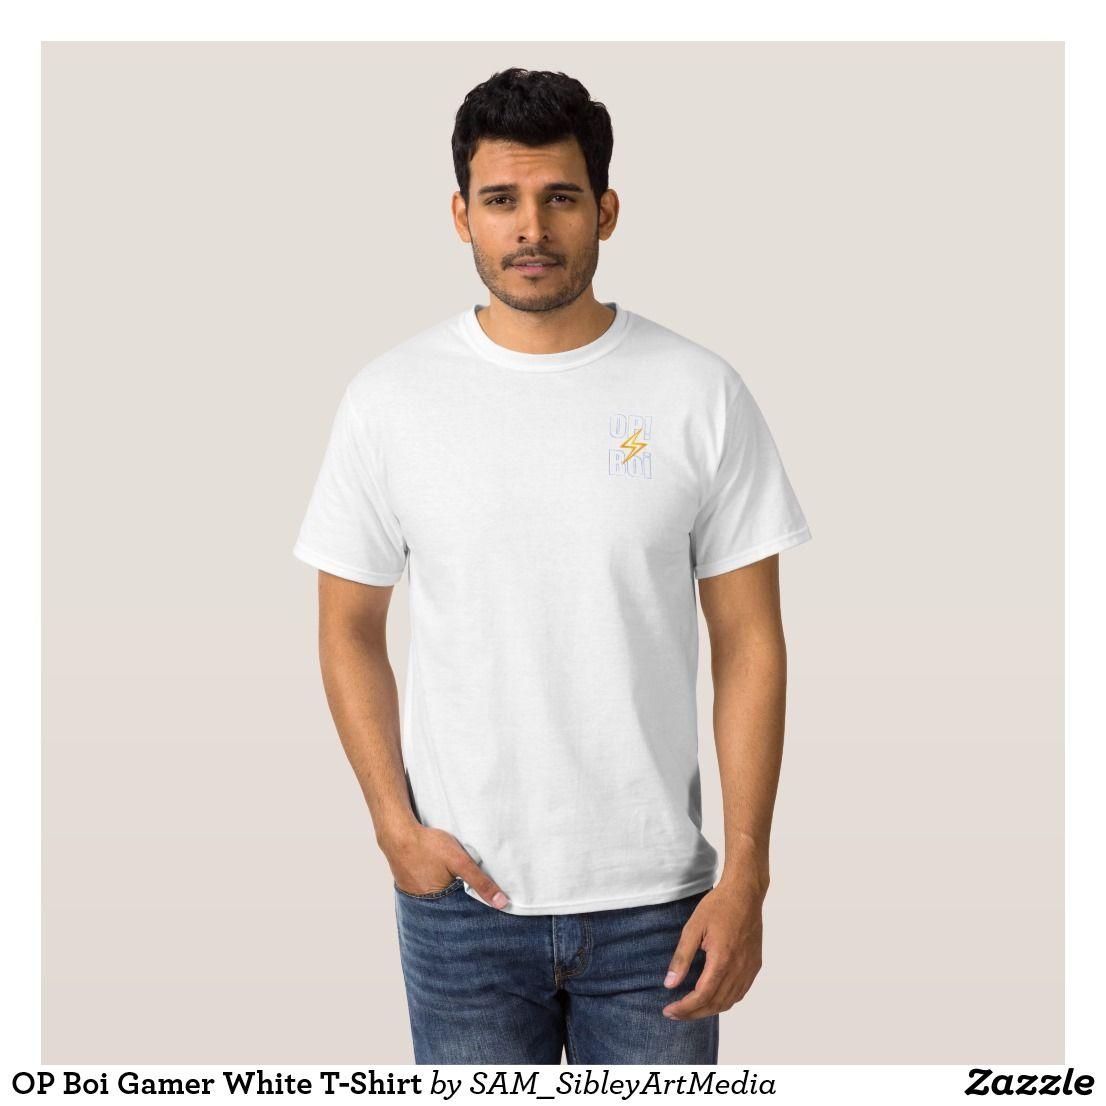 OP Boi Gamer White T-Shirt